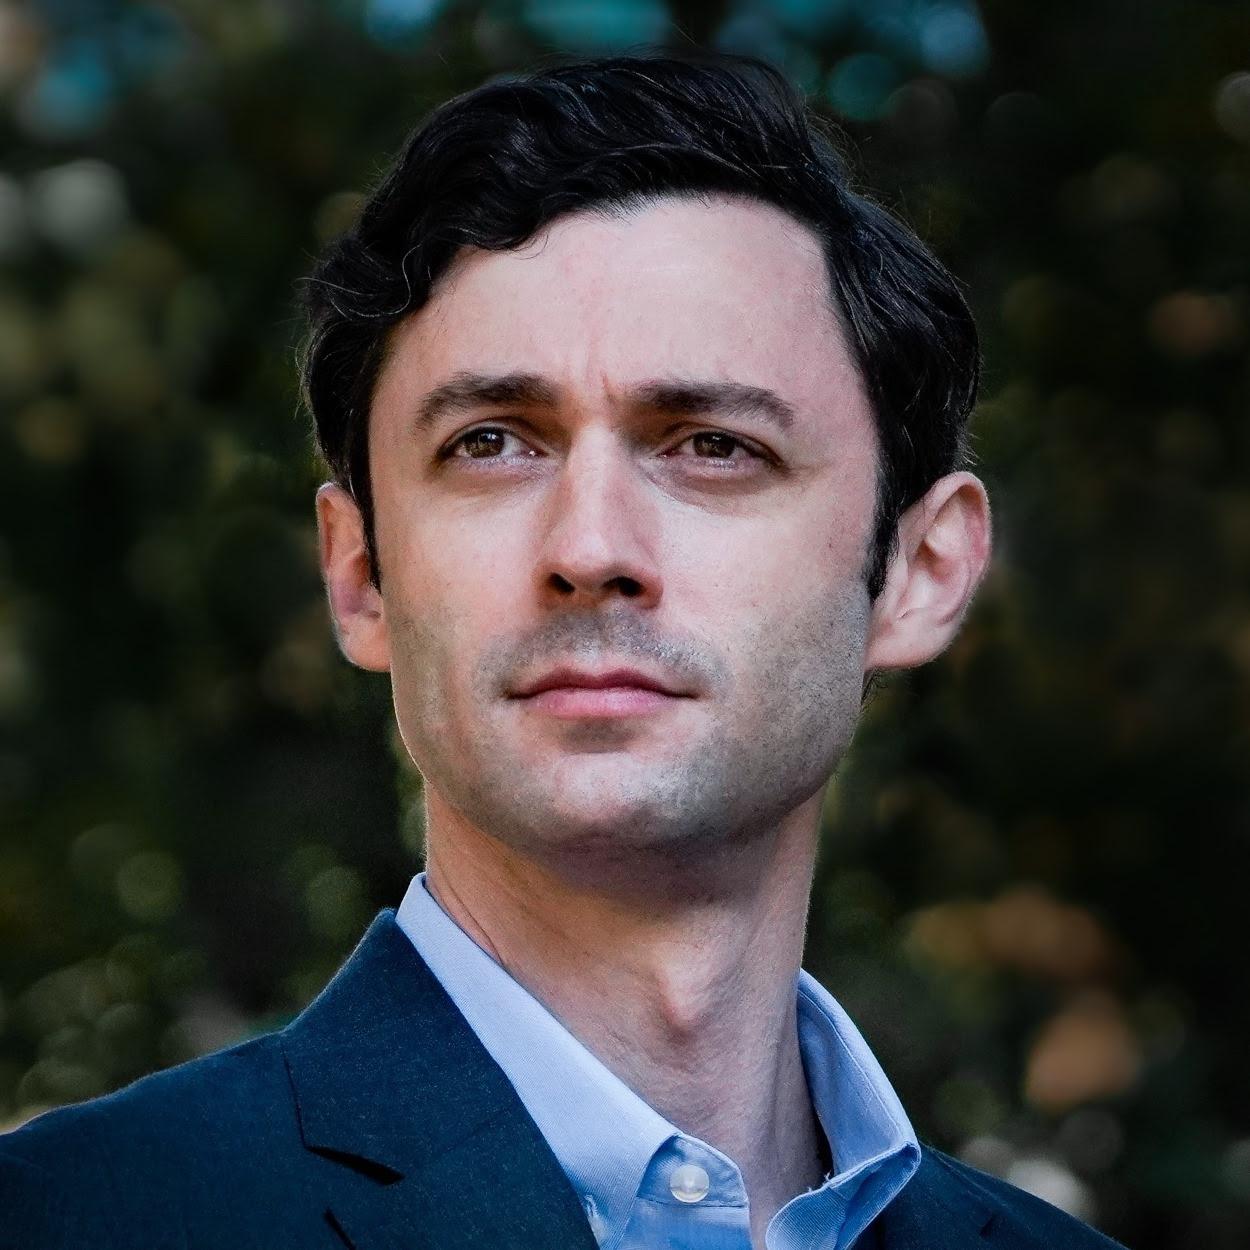 Support Jon Ossoff for Senate